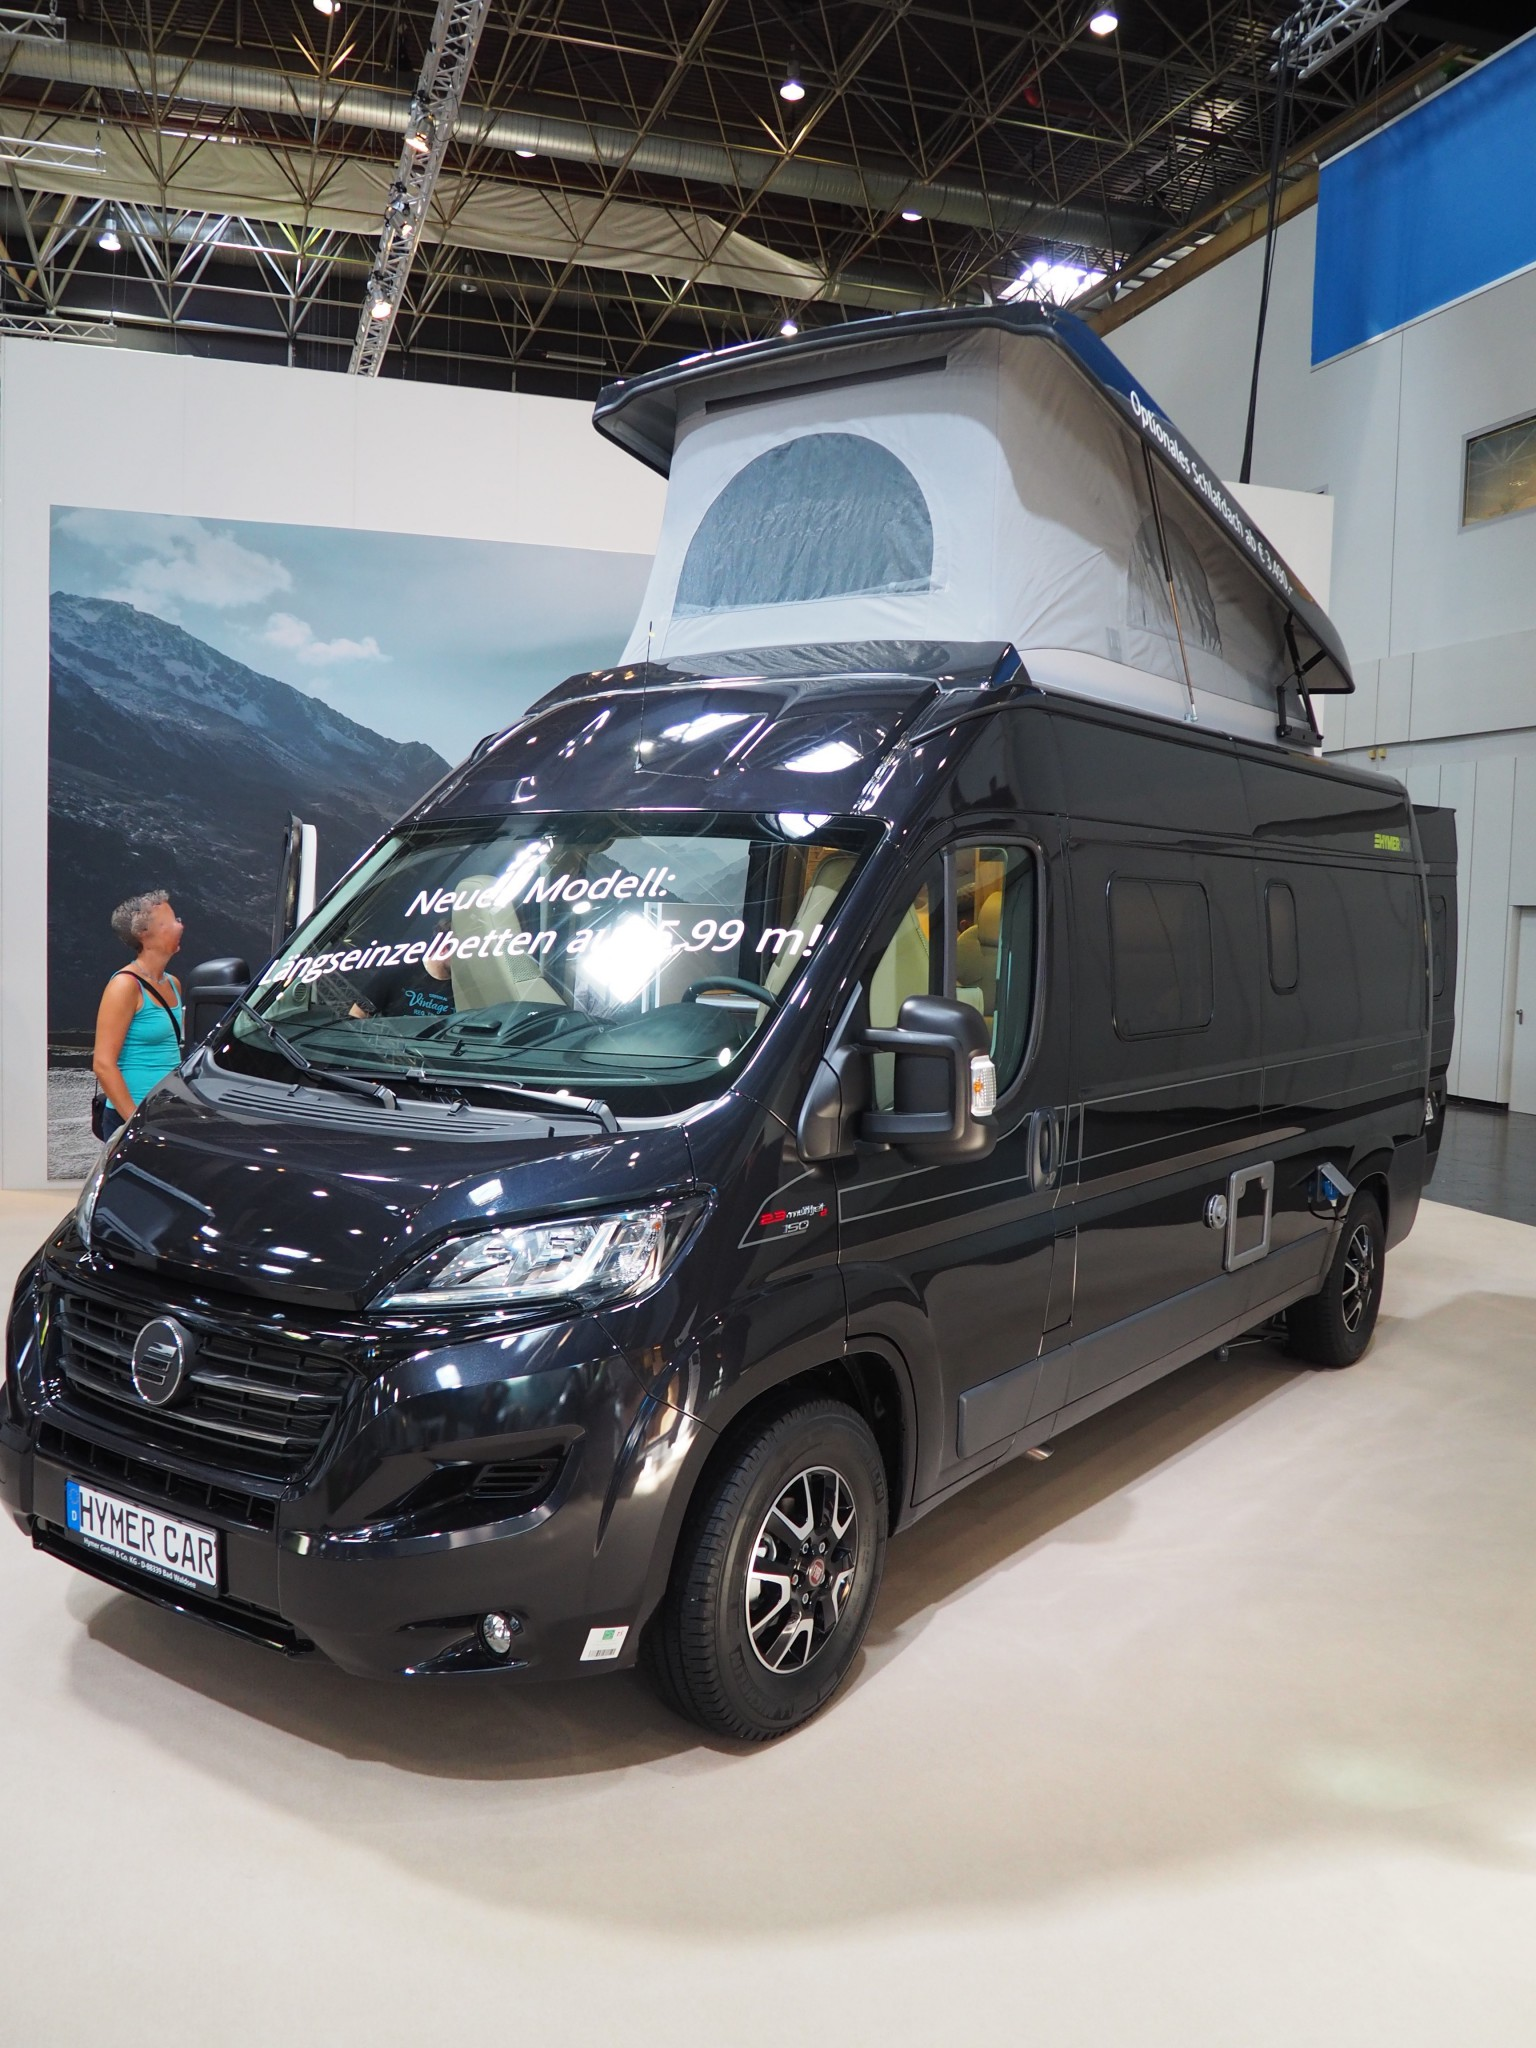 caravan salon hymercar yosemite familienurlaub im kastenwagen campingbus kastenwagen. Black Bedroom Furniture Sets. Home Design Ideas